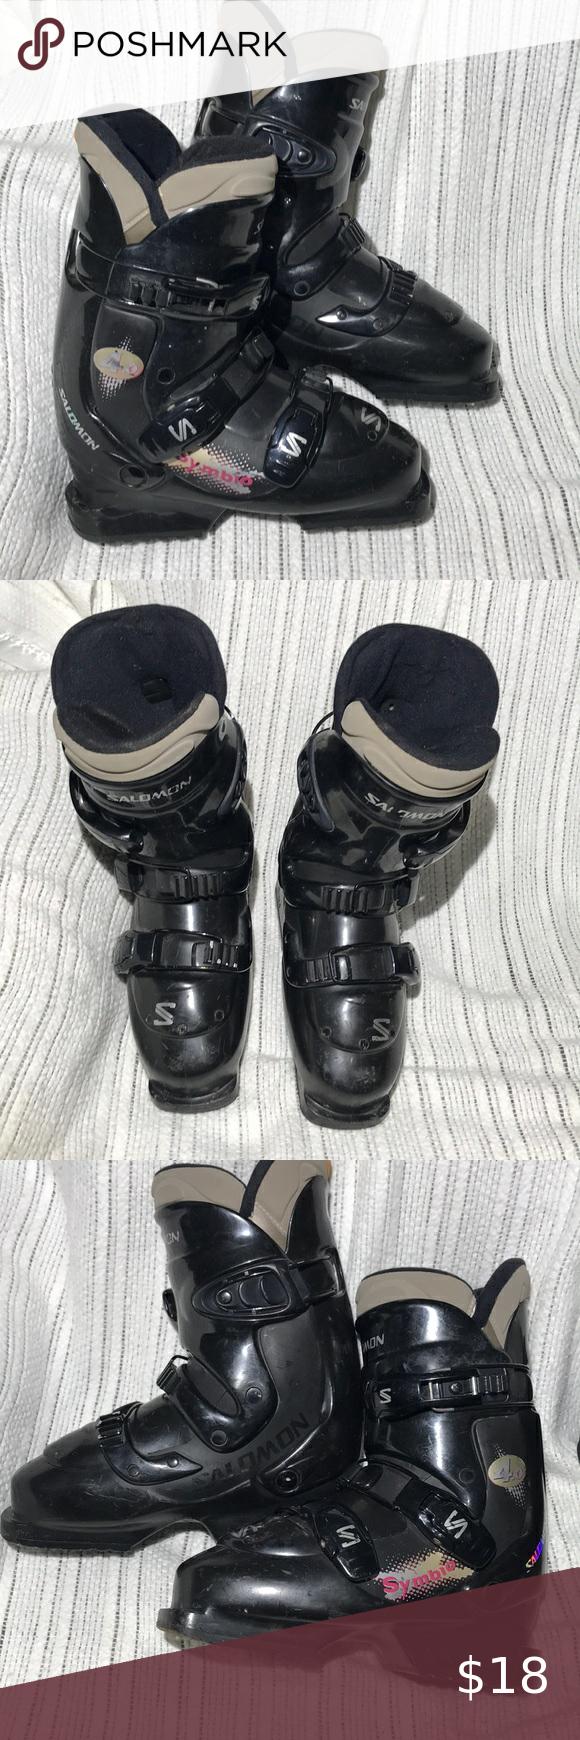 Salomon Symbio Ski Boots Salomon Symbio Flex 30 Size Mondo 24 5 Be Sure You Know Mondo Sizing Size Chart Online Says It Will Fit In 2020 Salomon Shoes Boots Ski Boots